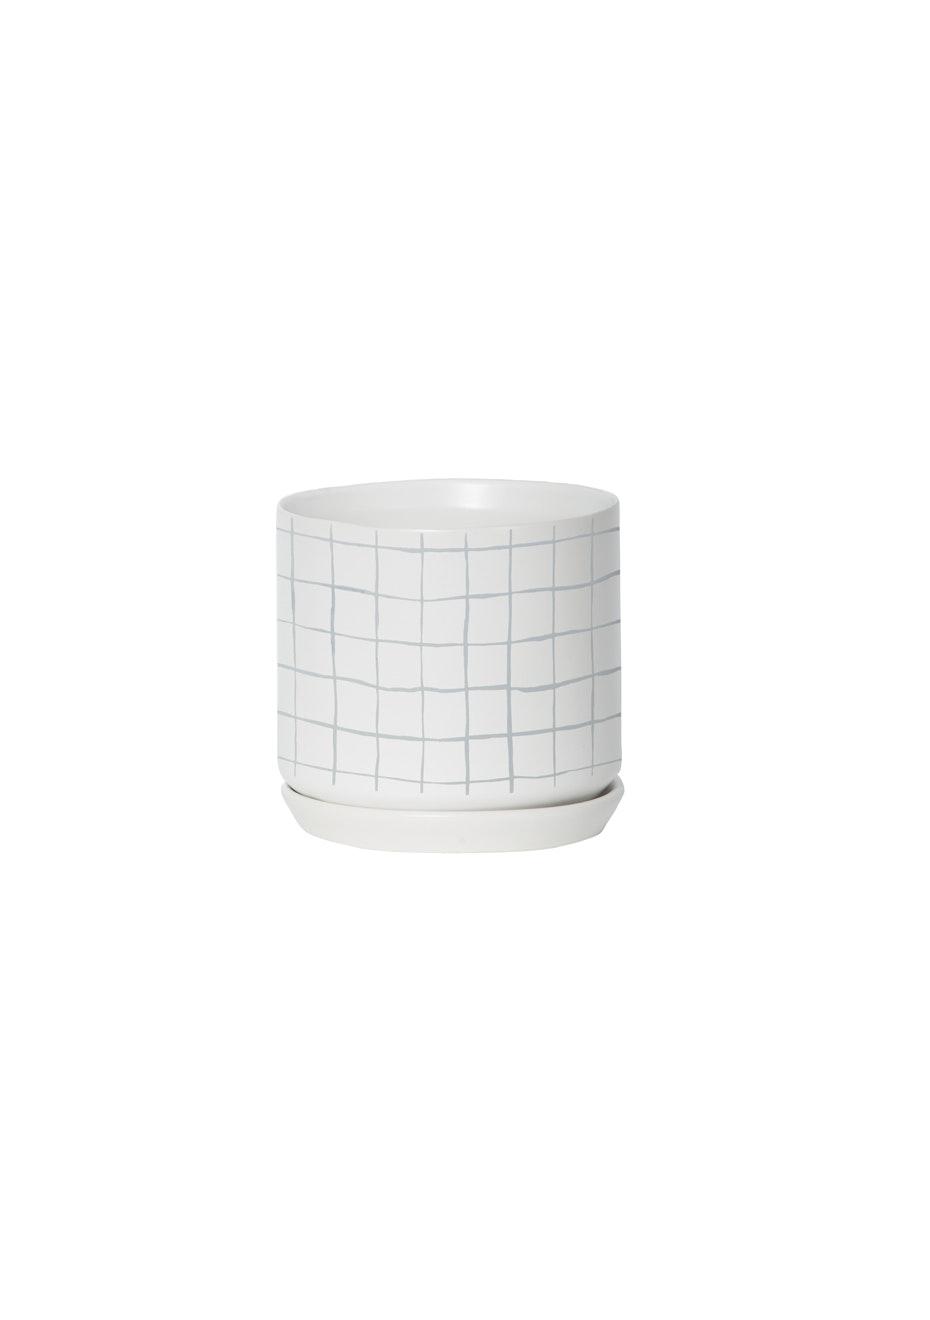 General Eclectic - Medium Oslo Planter Grey Grid